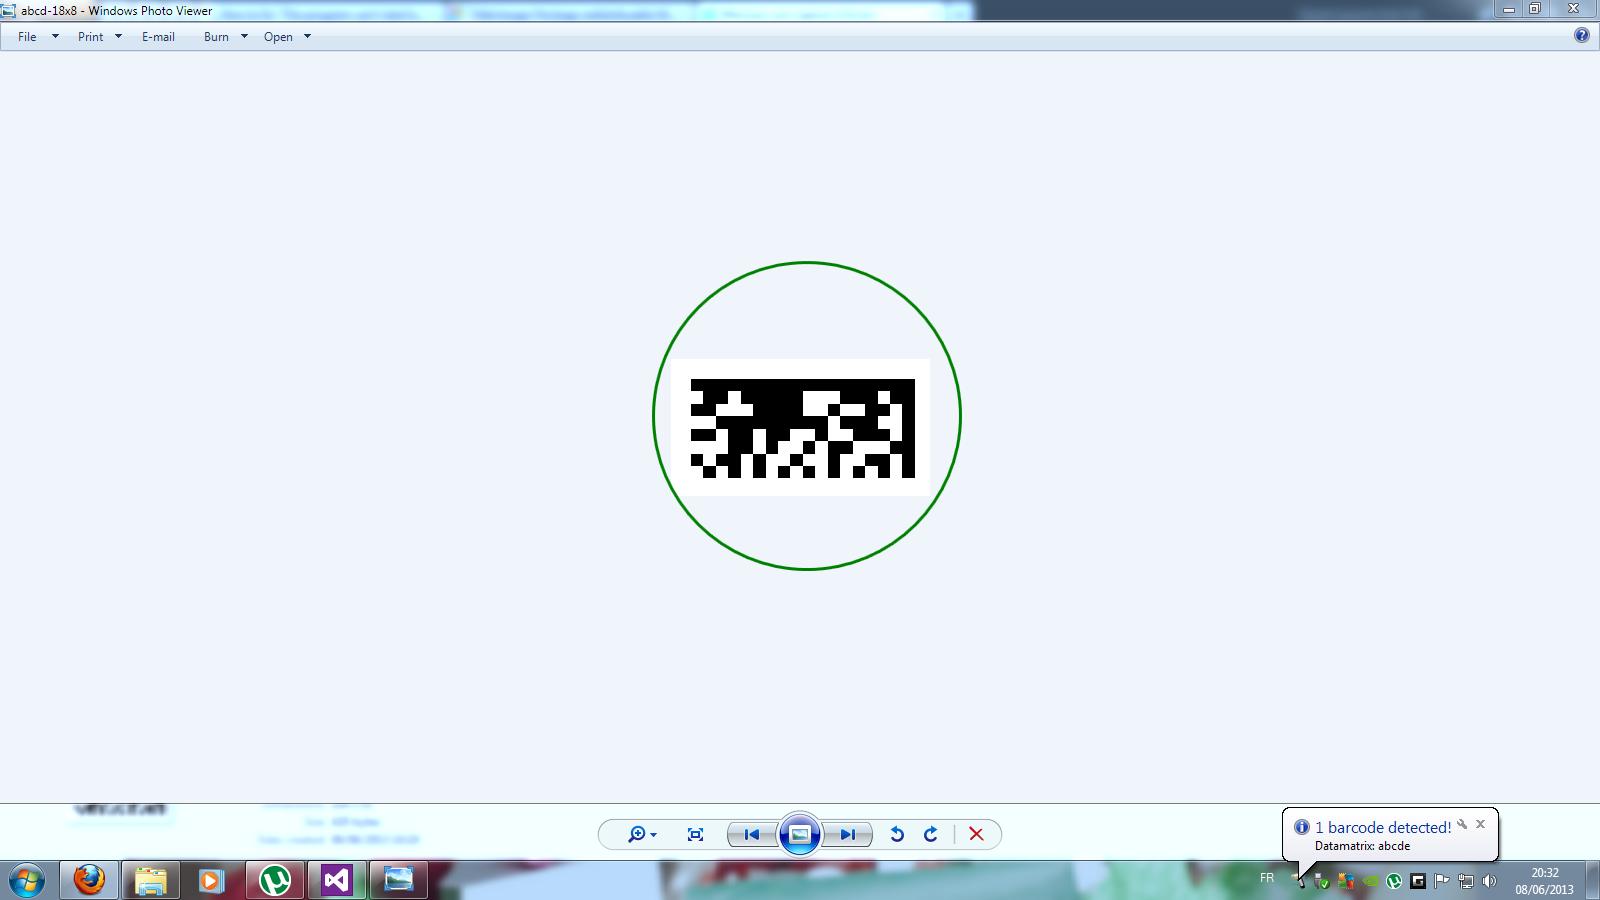 ORPALIS Imaging Technologies: Virtual Barcode Reader Free